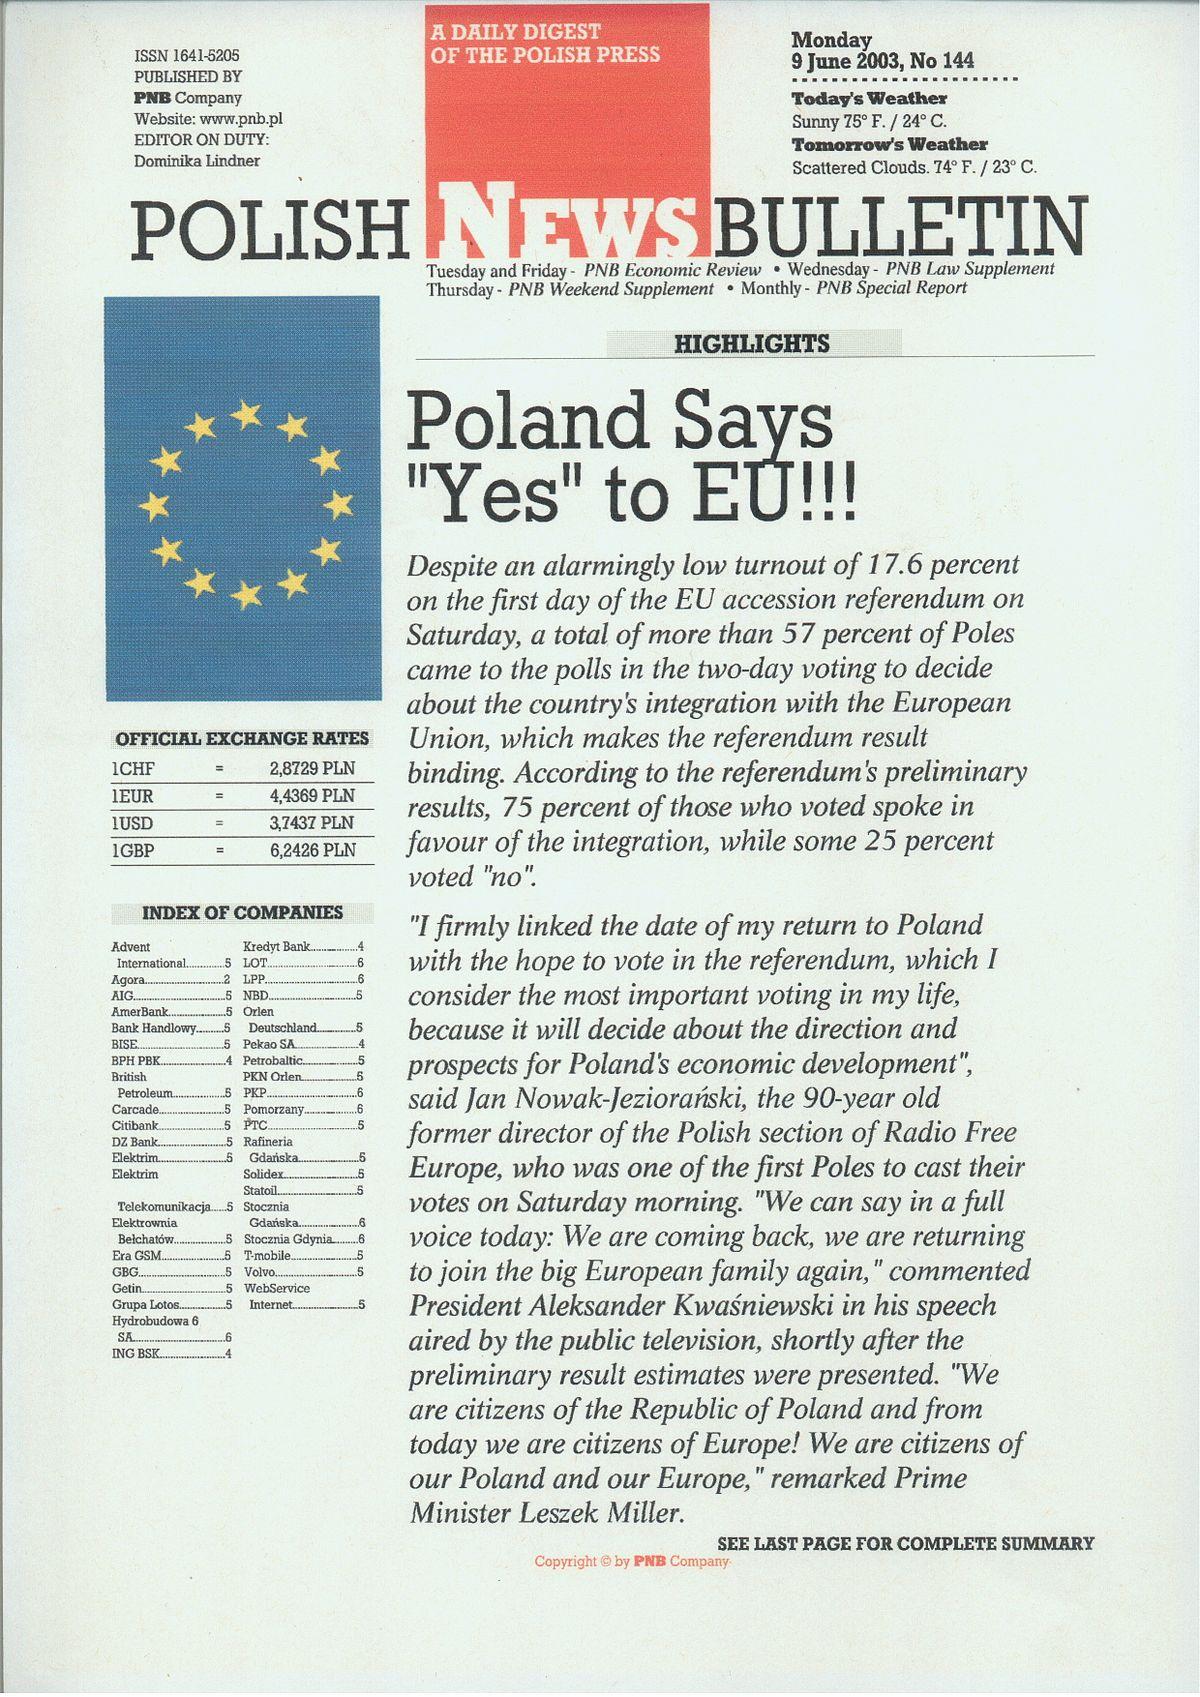 The Polish News Bulletin Wikipedia